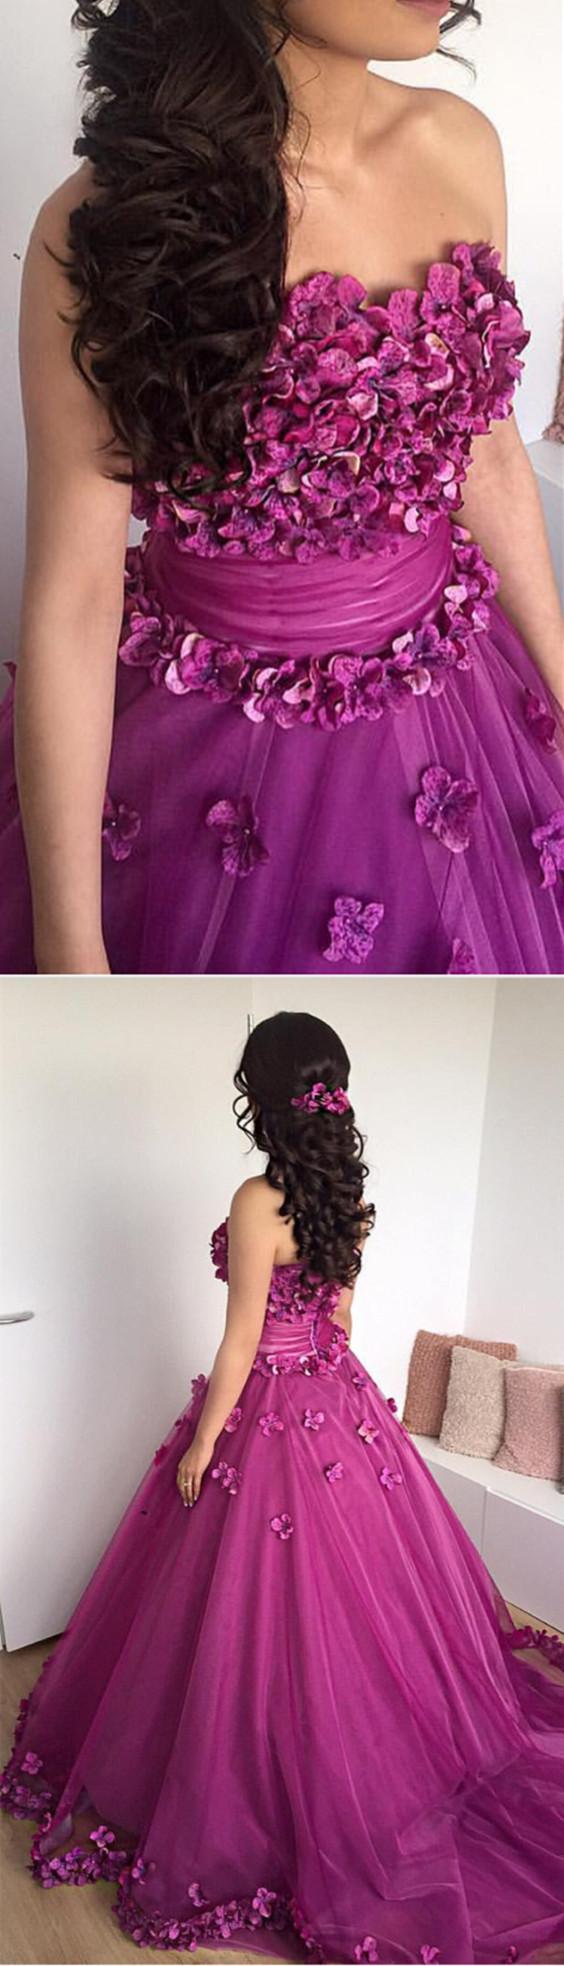 Purple quinceanera dressball gowns prom dressflower prom dresss